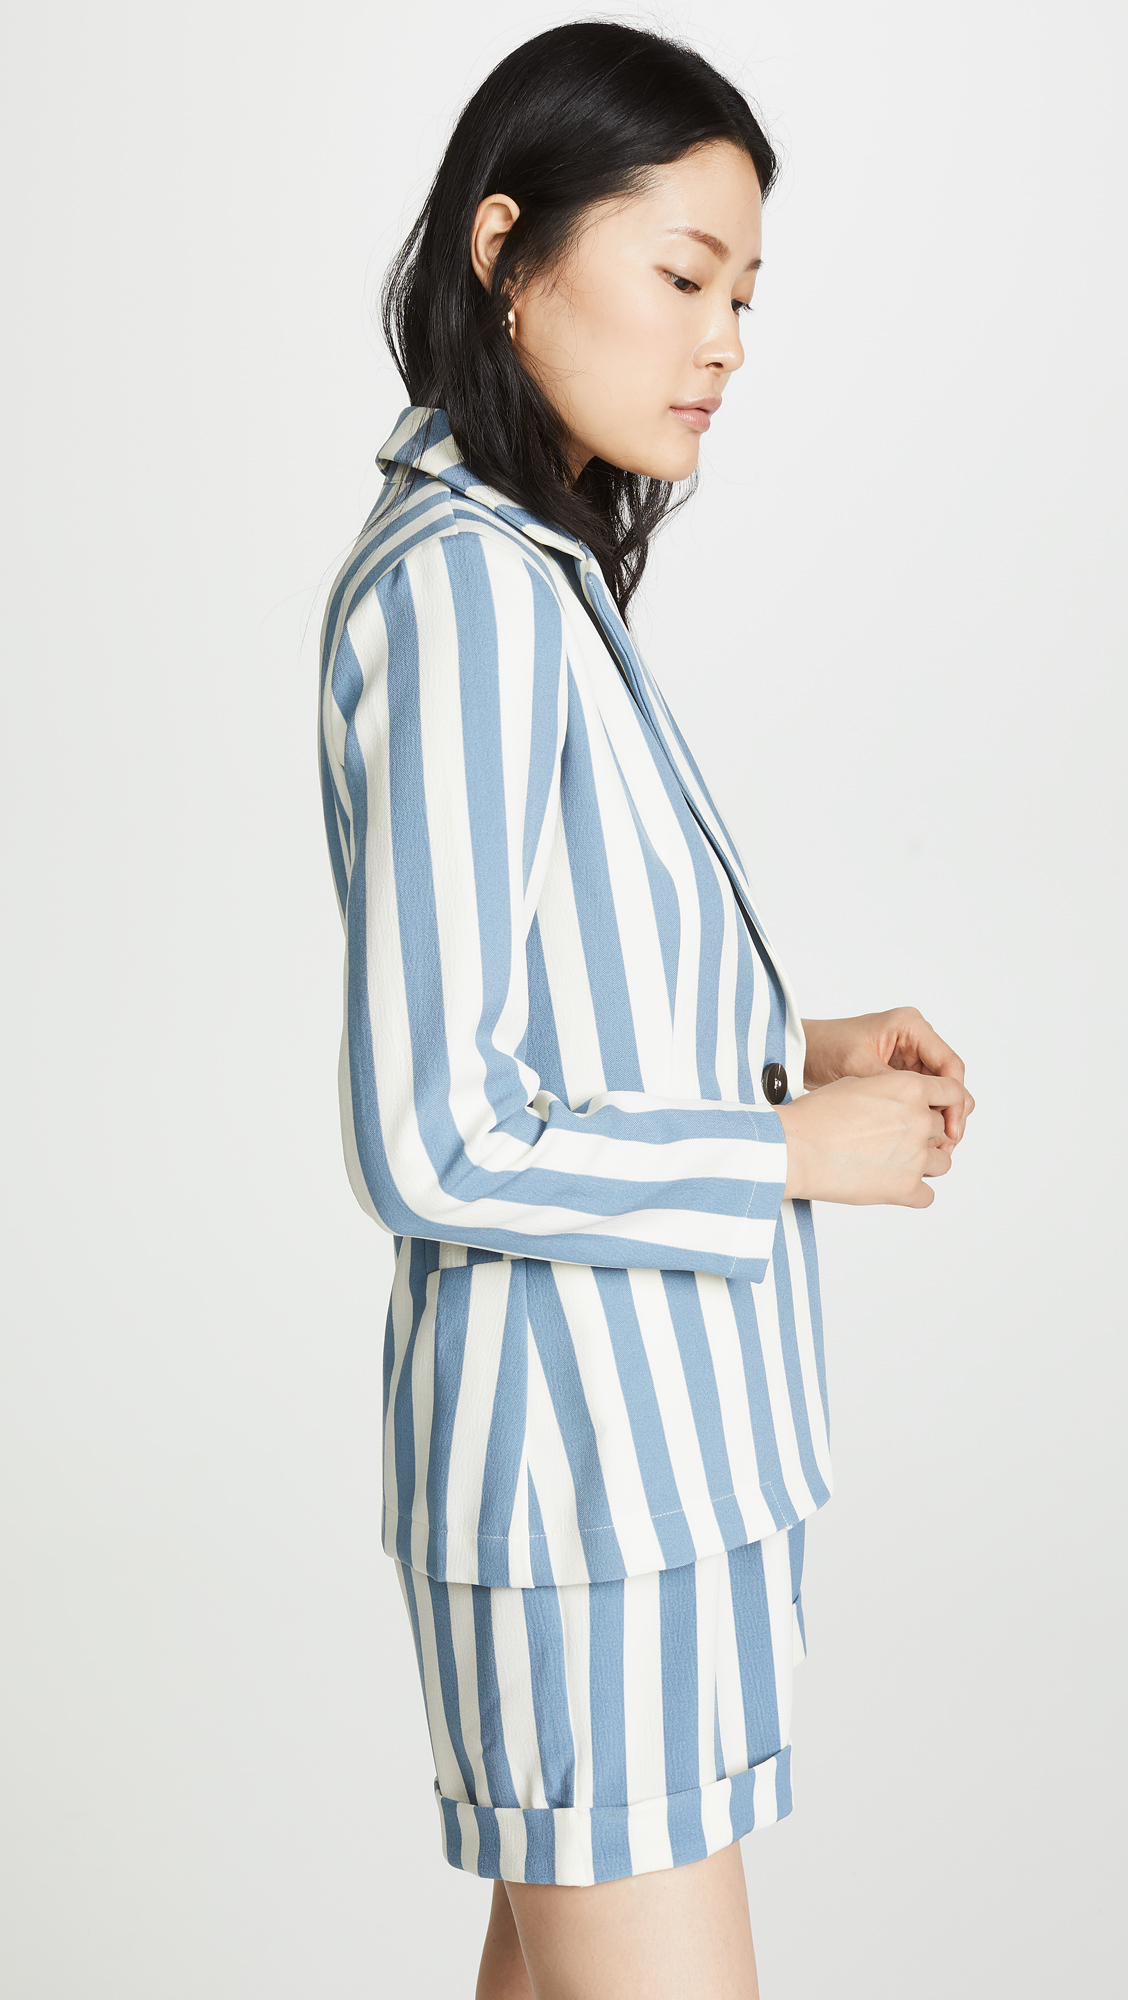 Chriselle Lim Collection Blue Stripe Blazer